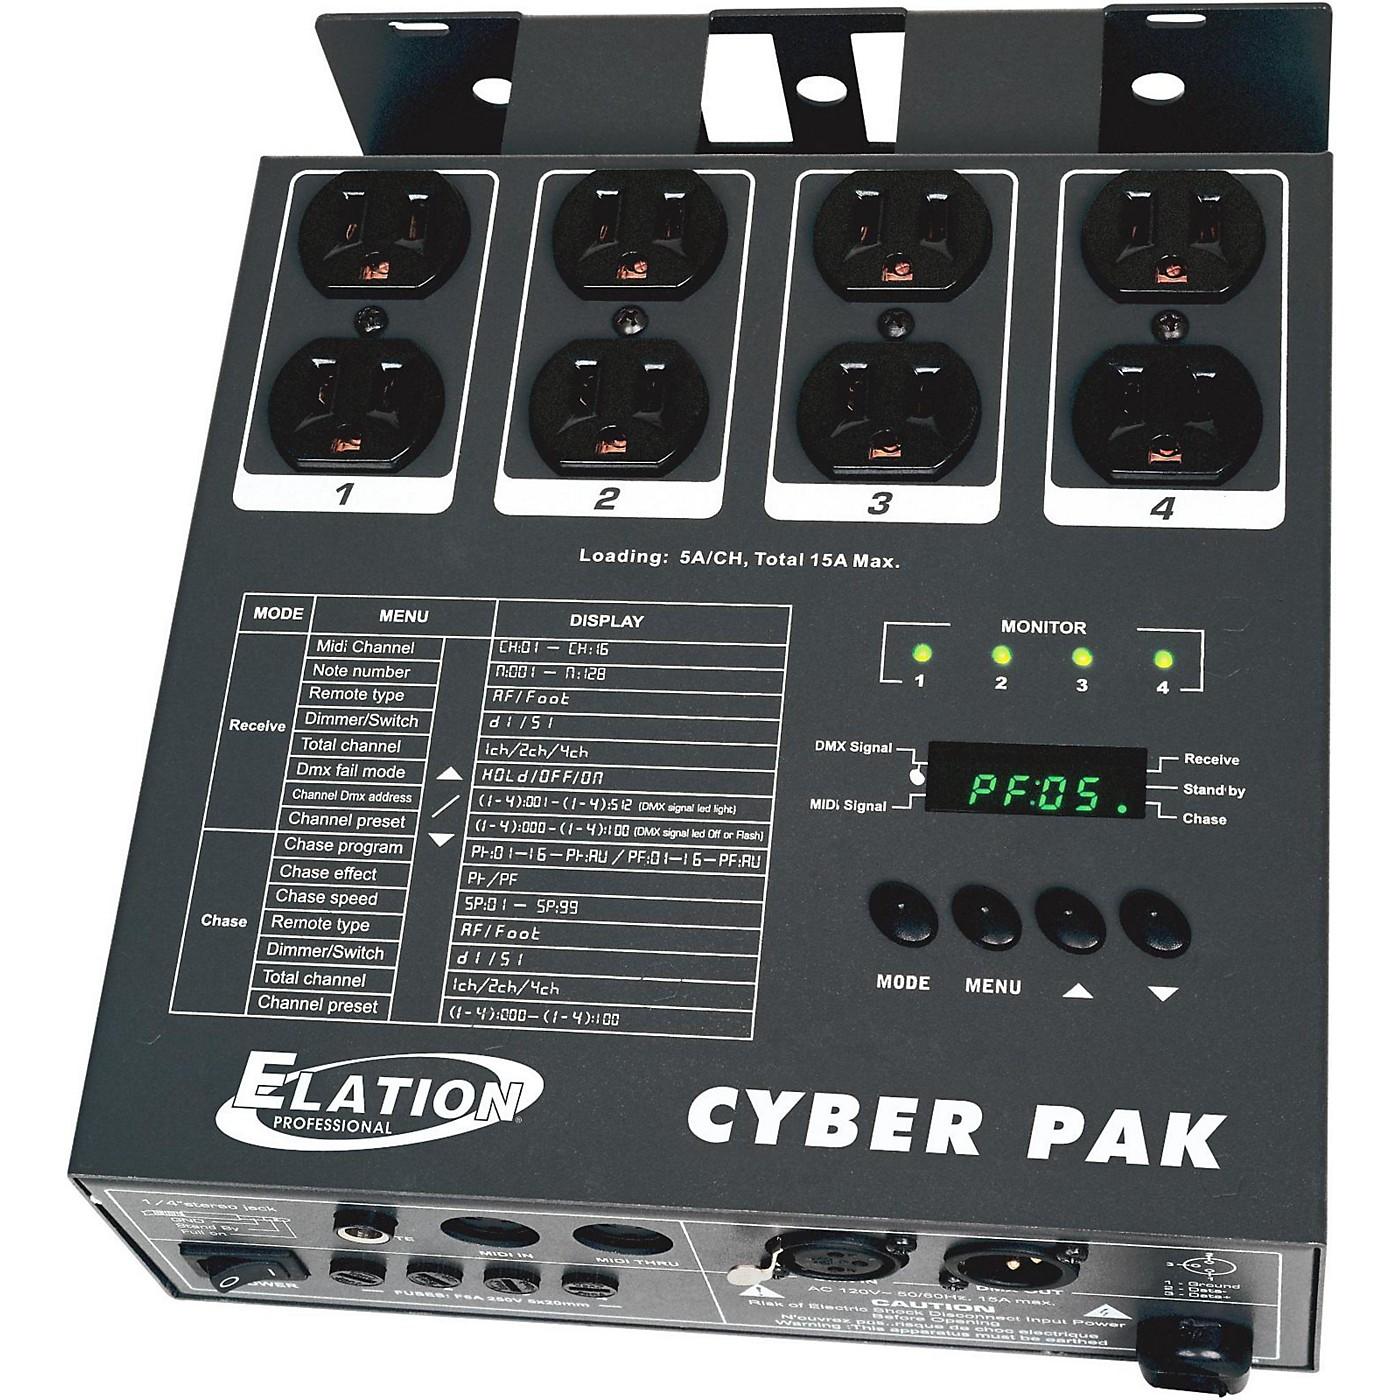 Elation CYBER PAK 4-Channel Dimmer thumbnail